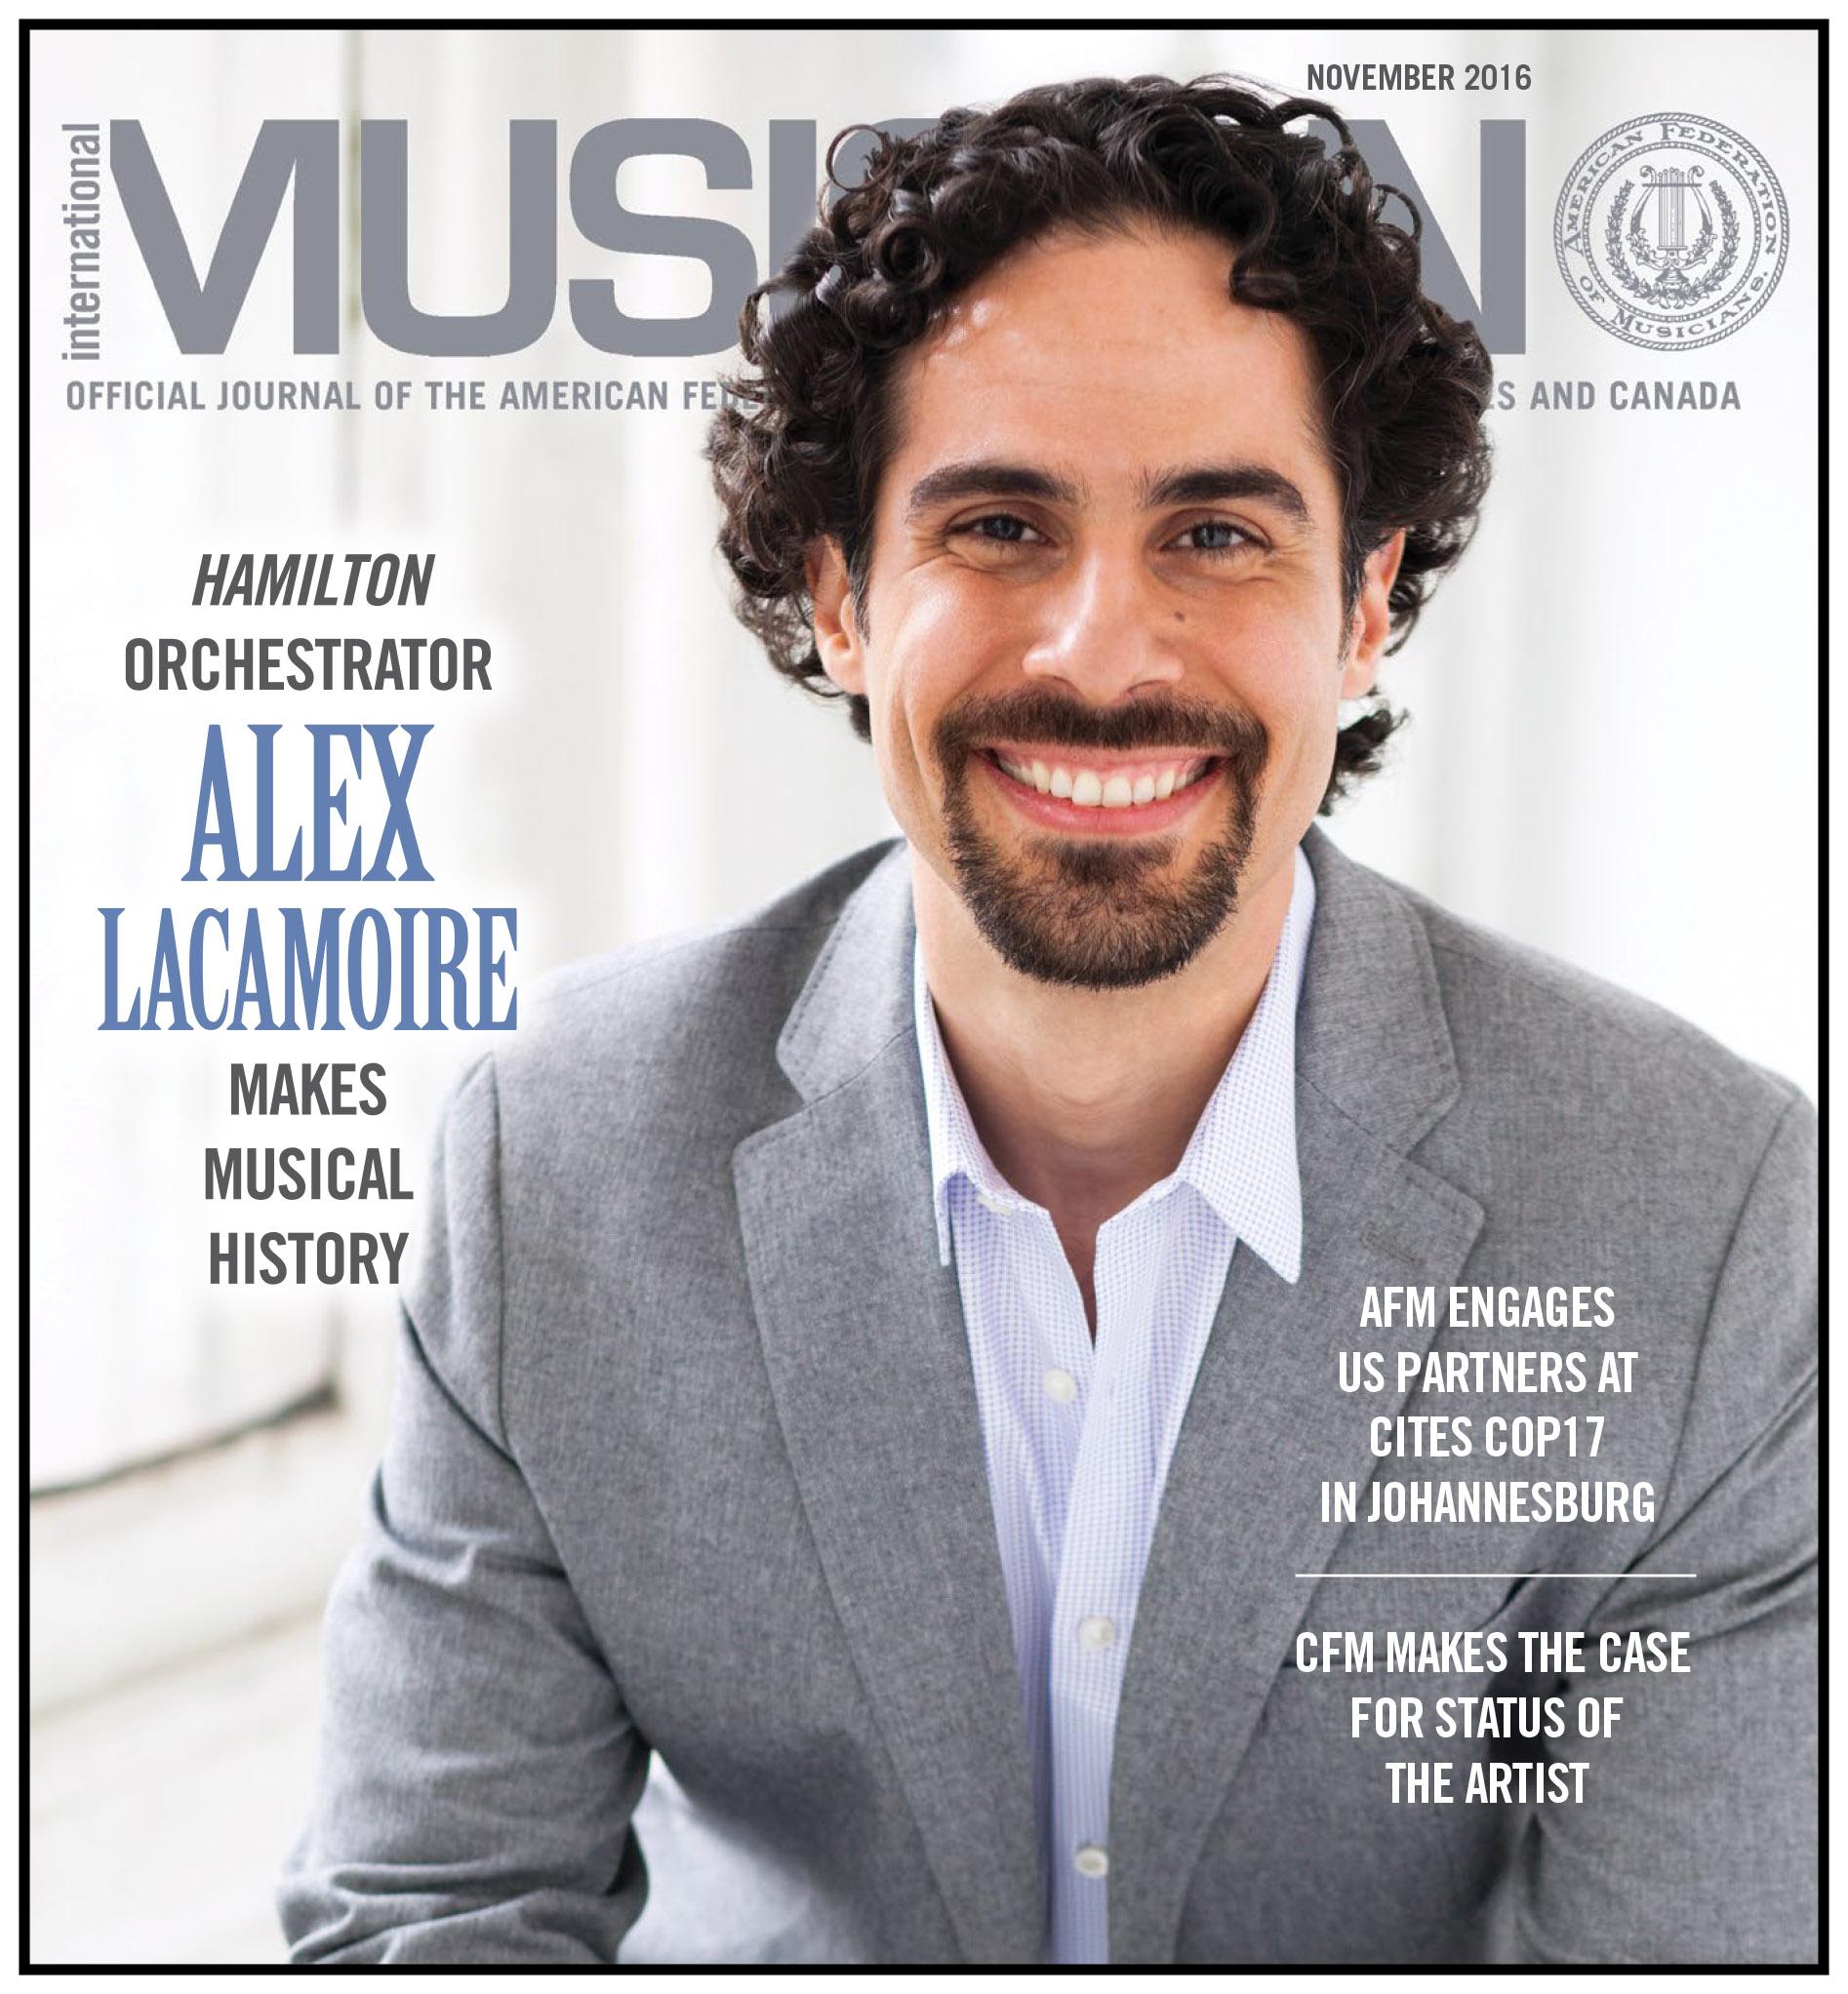 V114-11 - November 2016 - International Musician Magazine